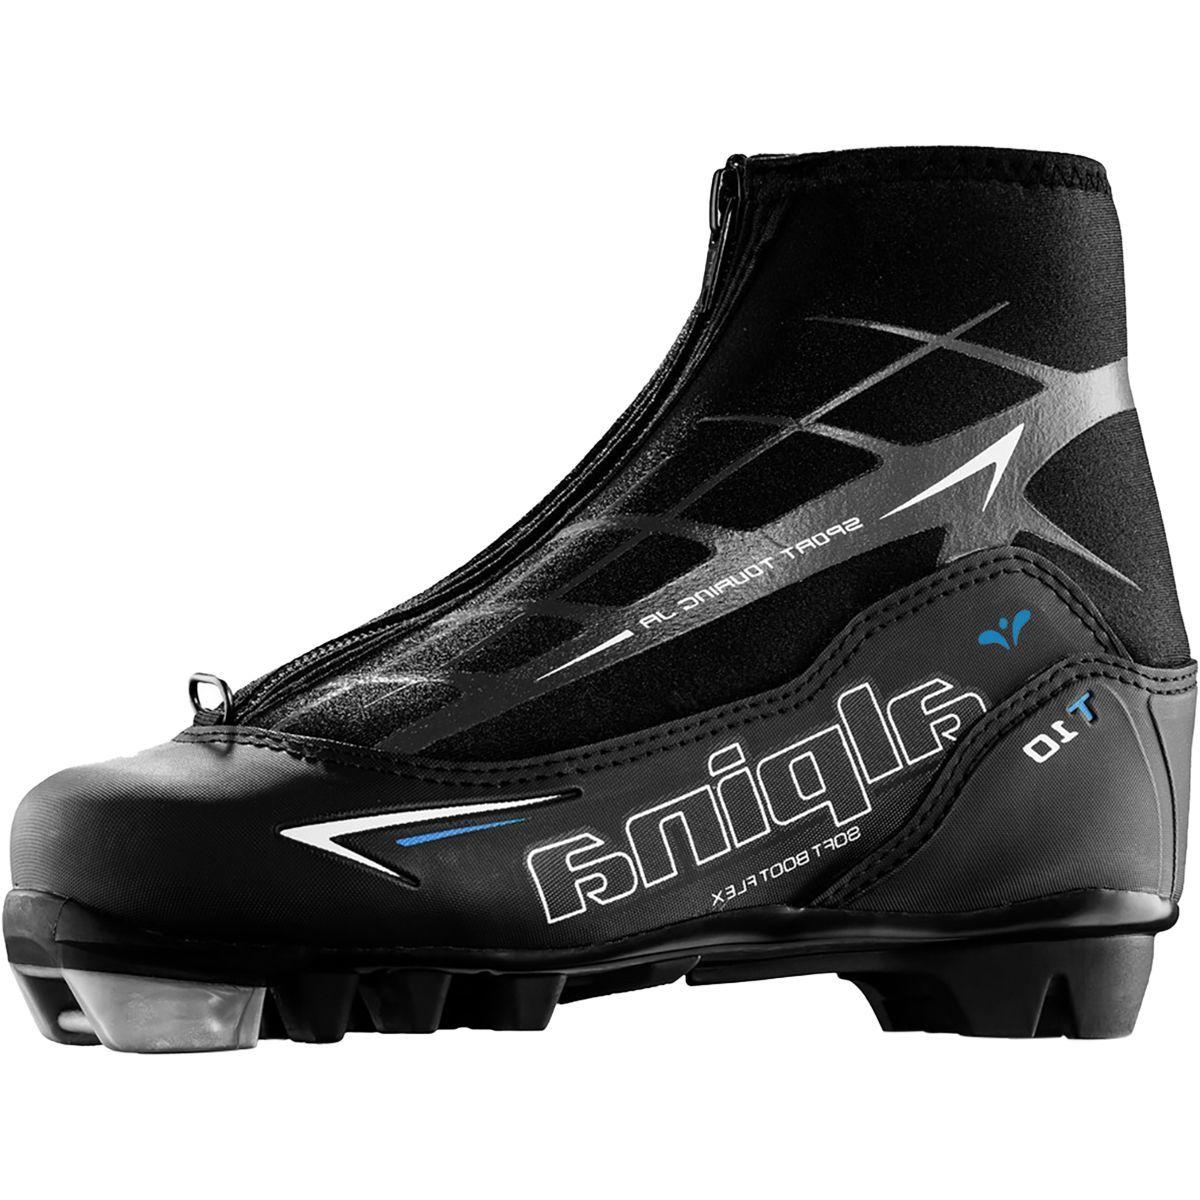 Alpina T 10 Eve Touring Boot - Women's